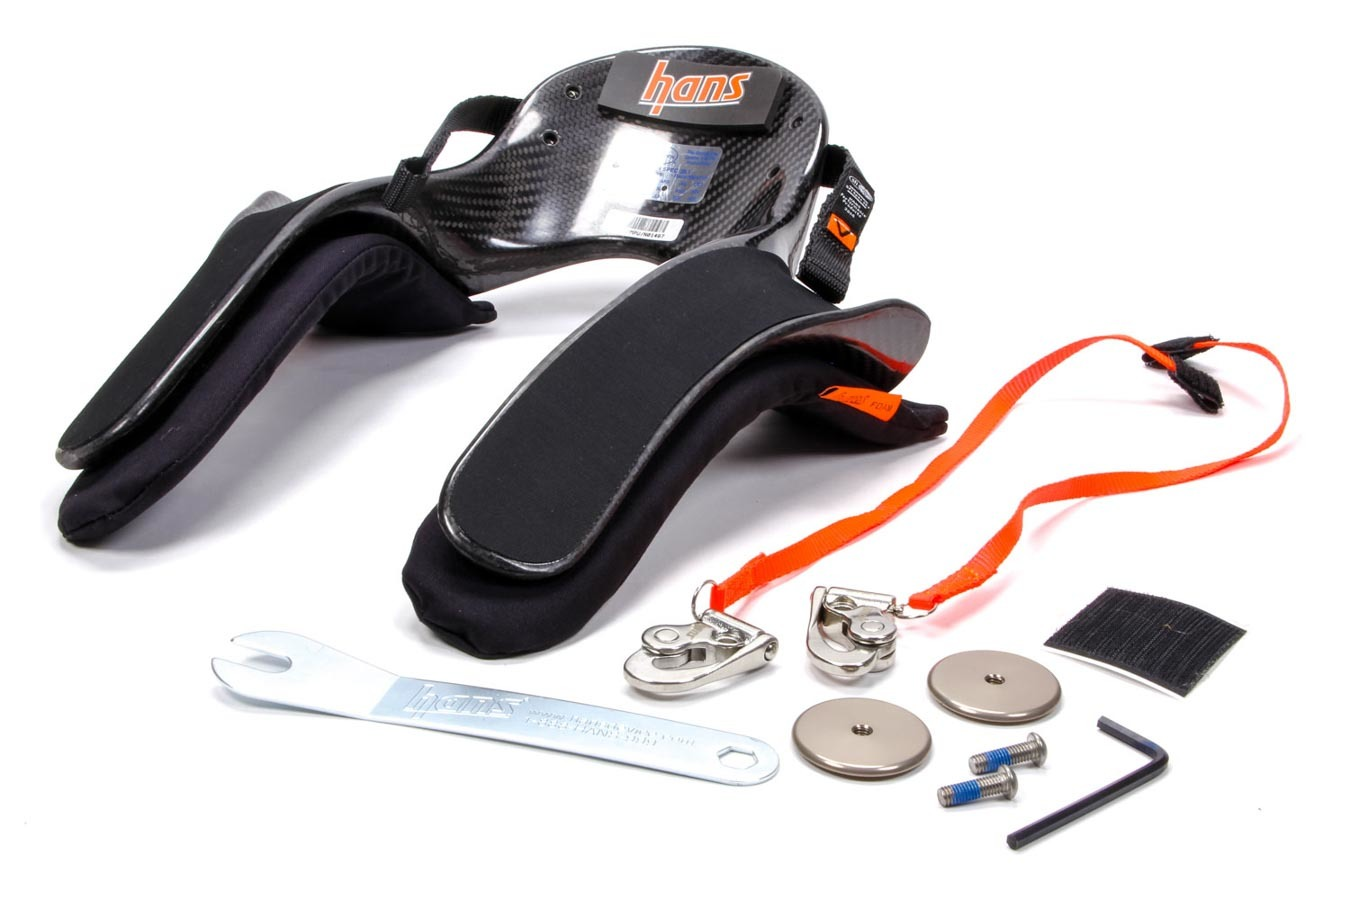 Hans DK13235.42SFI Head and Neck Support, Ultra Pro Model 20, SFI 38.1, Sliding Quick Click Tether, Helmet Anchor, Carbon Fiber, Medium, Kit